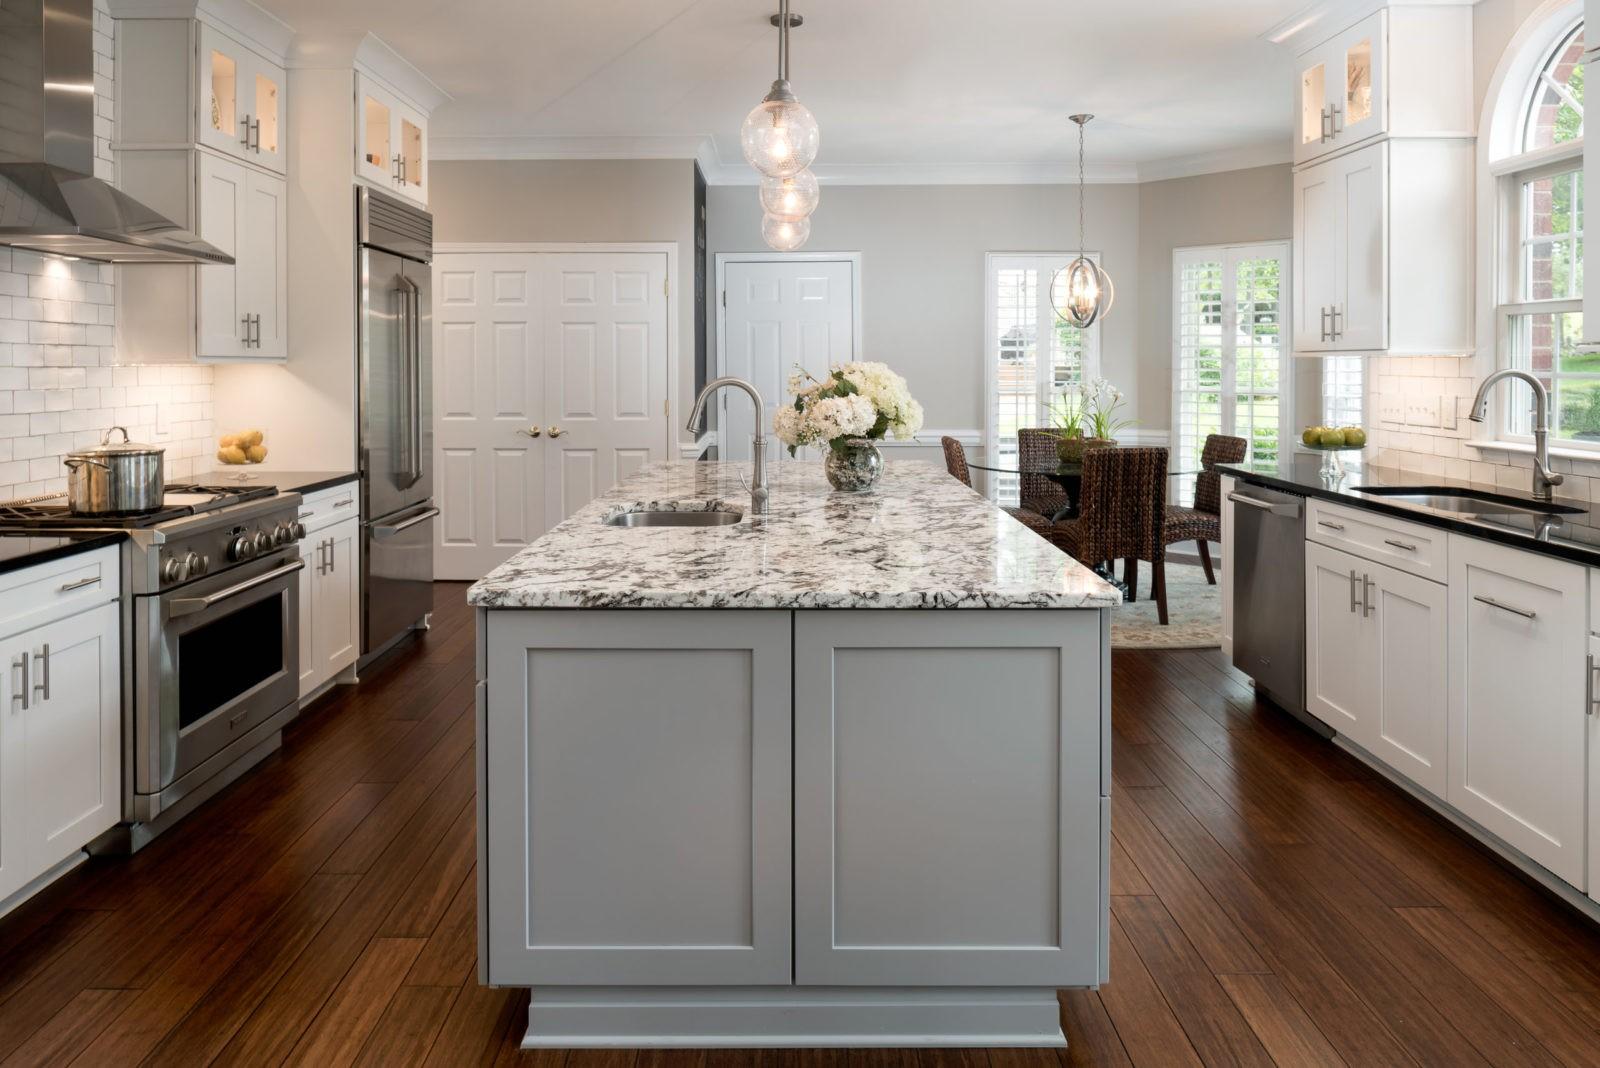 shaker-style-kitchen-design